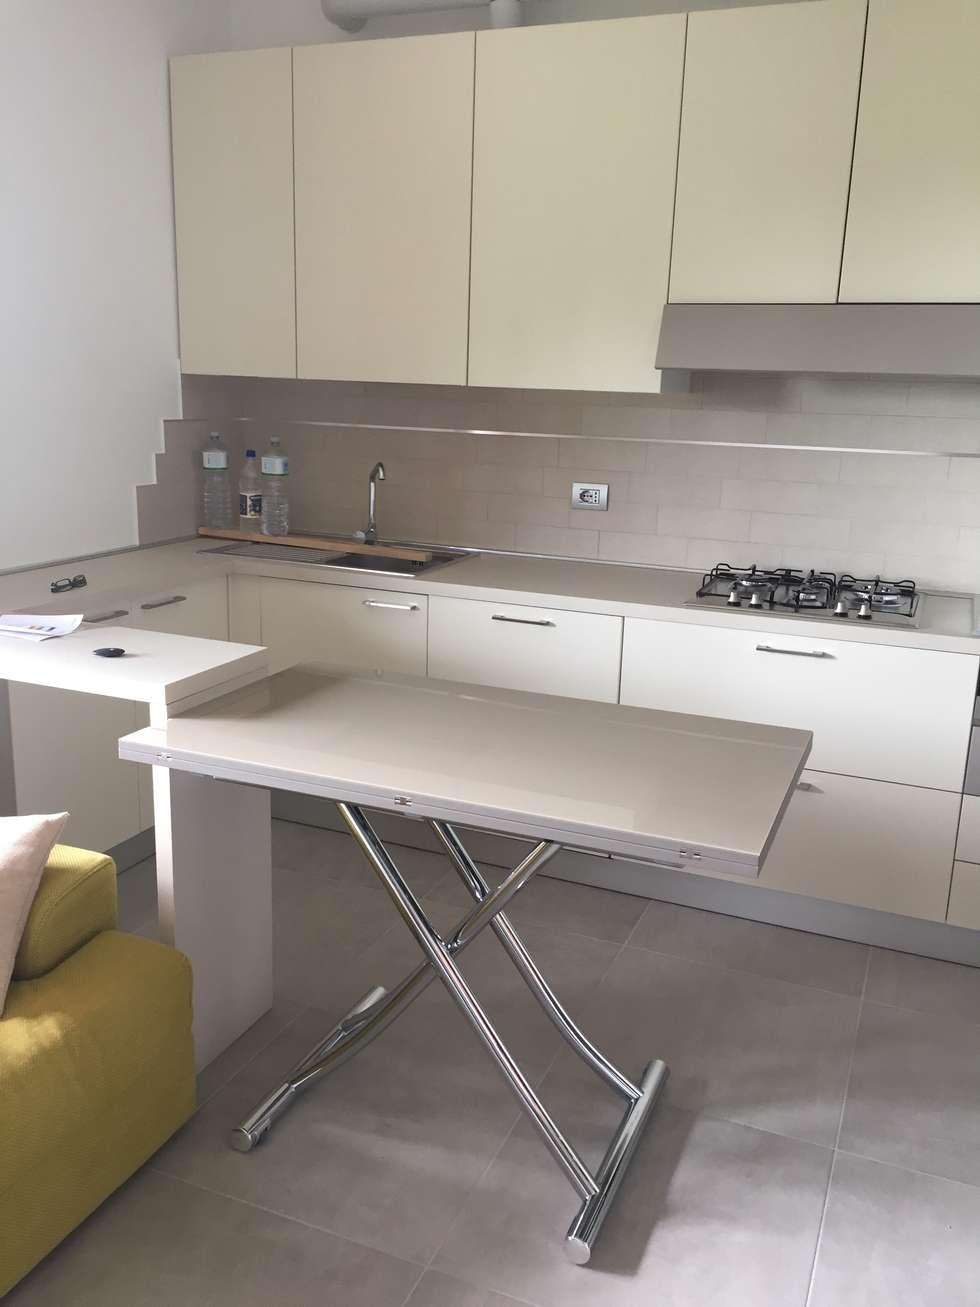 Cucina in openspace: Cucina in stile in stile Moderno di Arreda Progetta di Alice Bambini